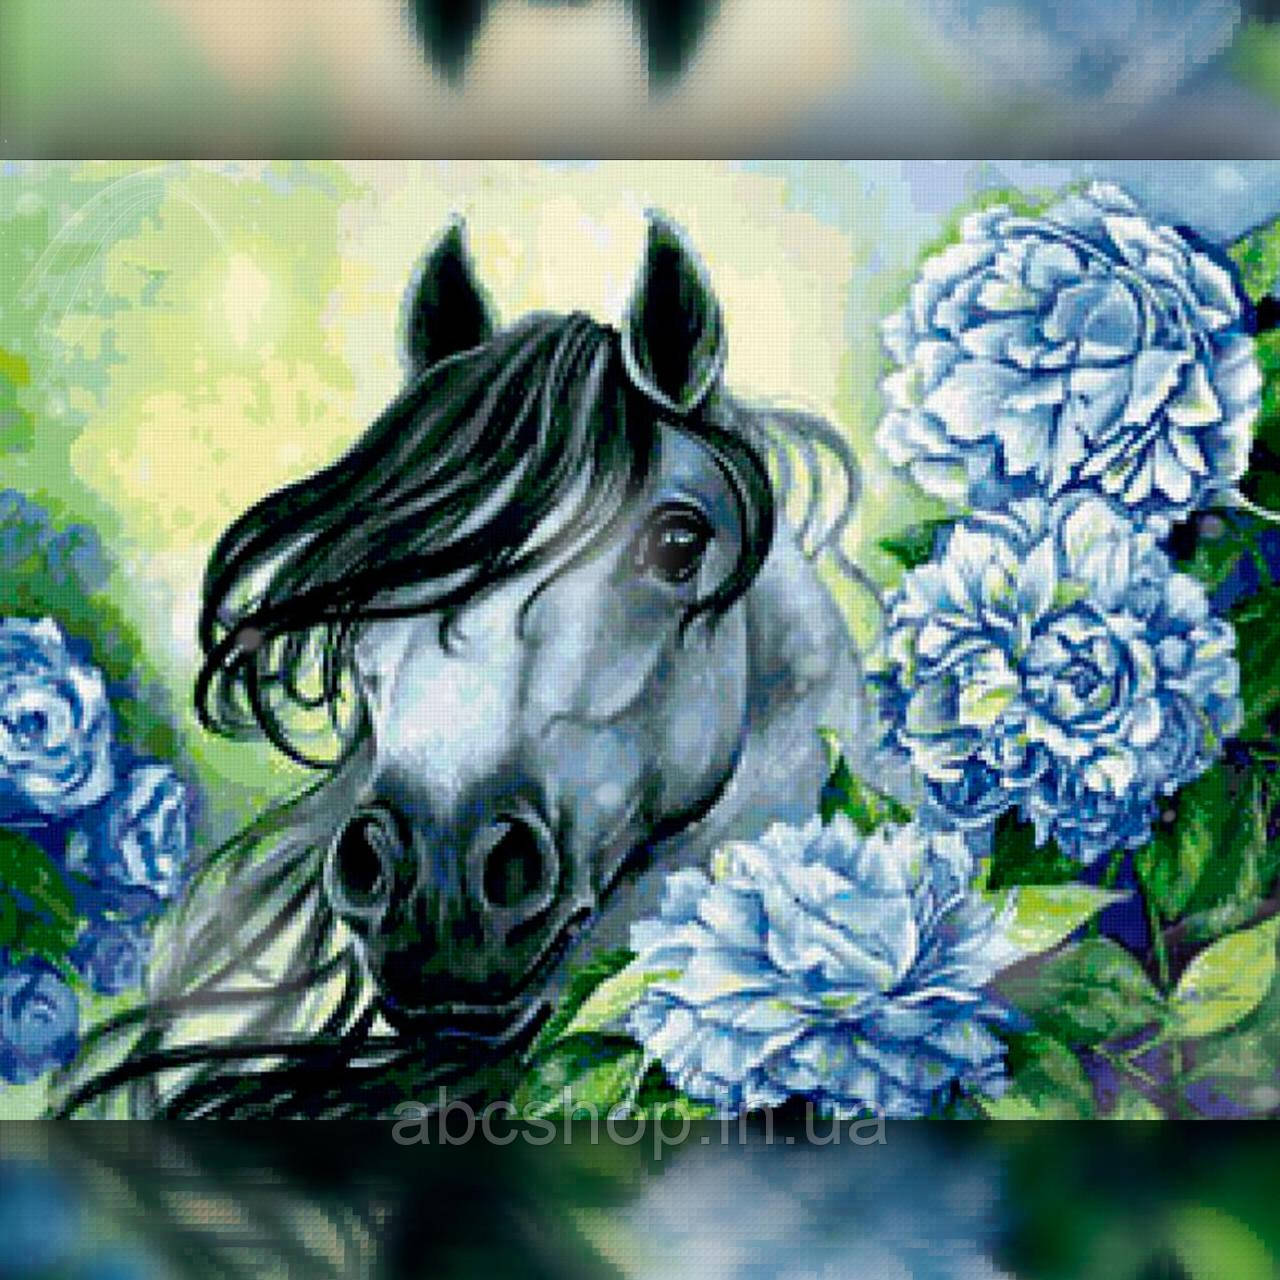 Алмазная вышивка Лошадь в цветах 40x50 The Wortex Diamonds (TWD20031L)